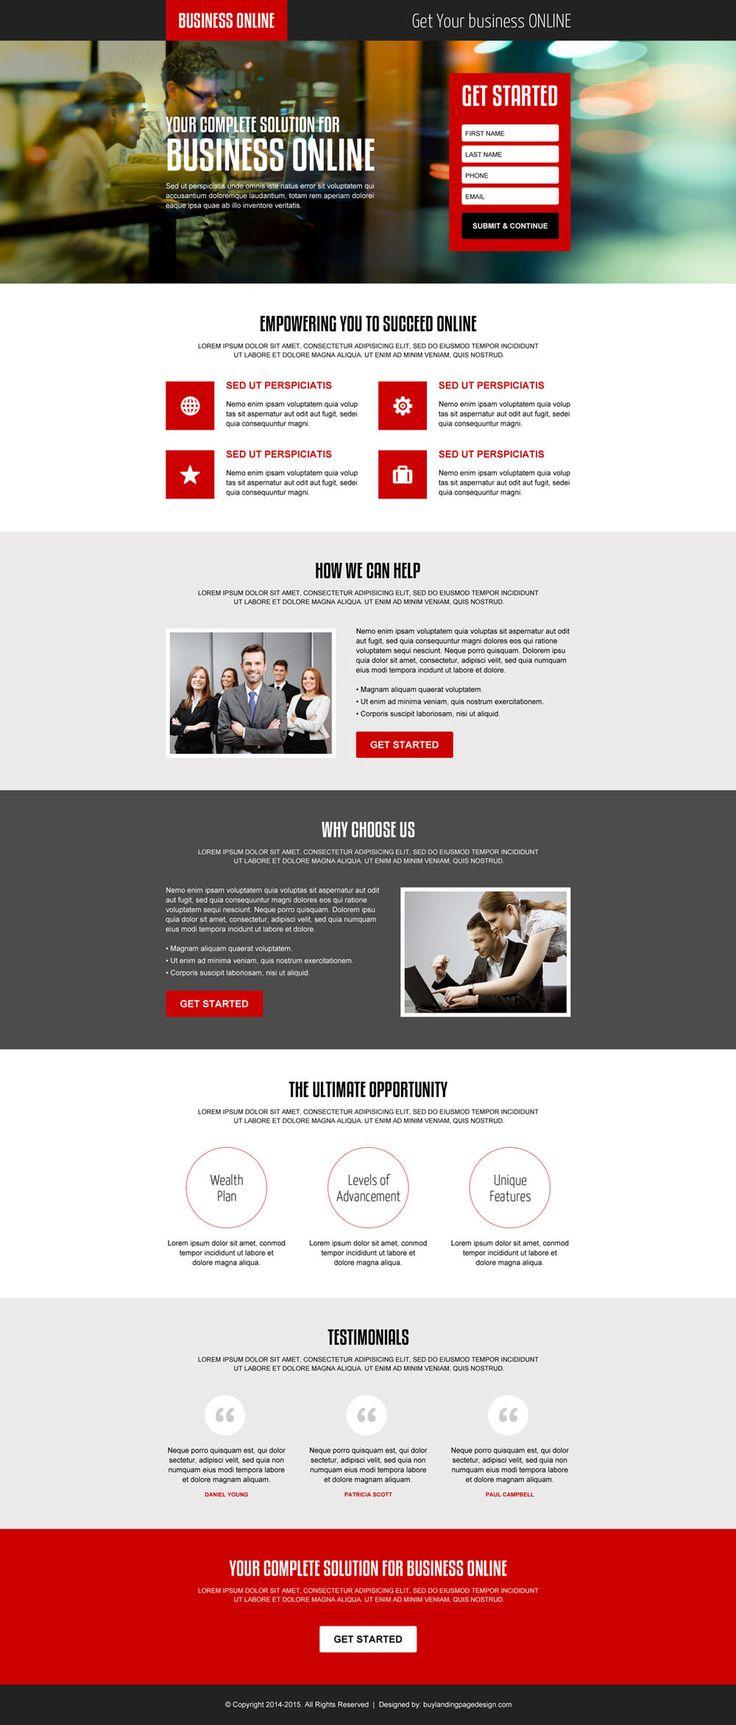 complete solution for online business professional lead capture landing page design